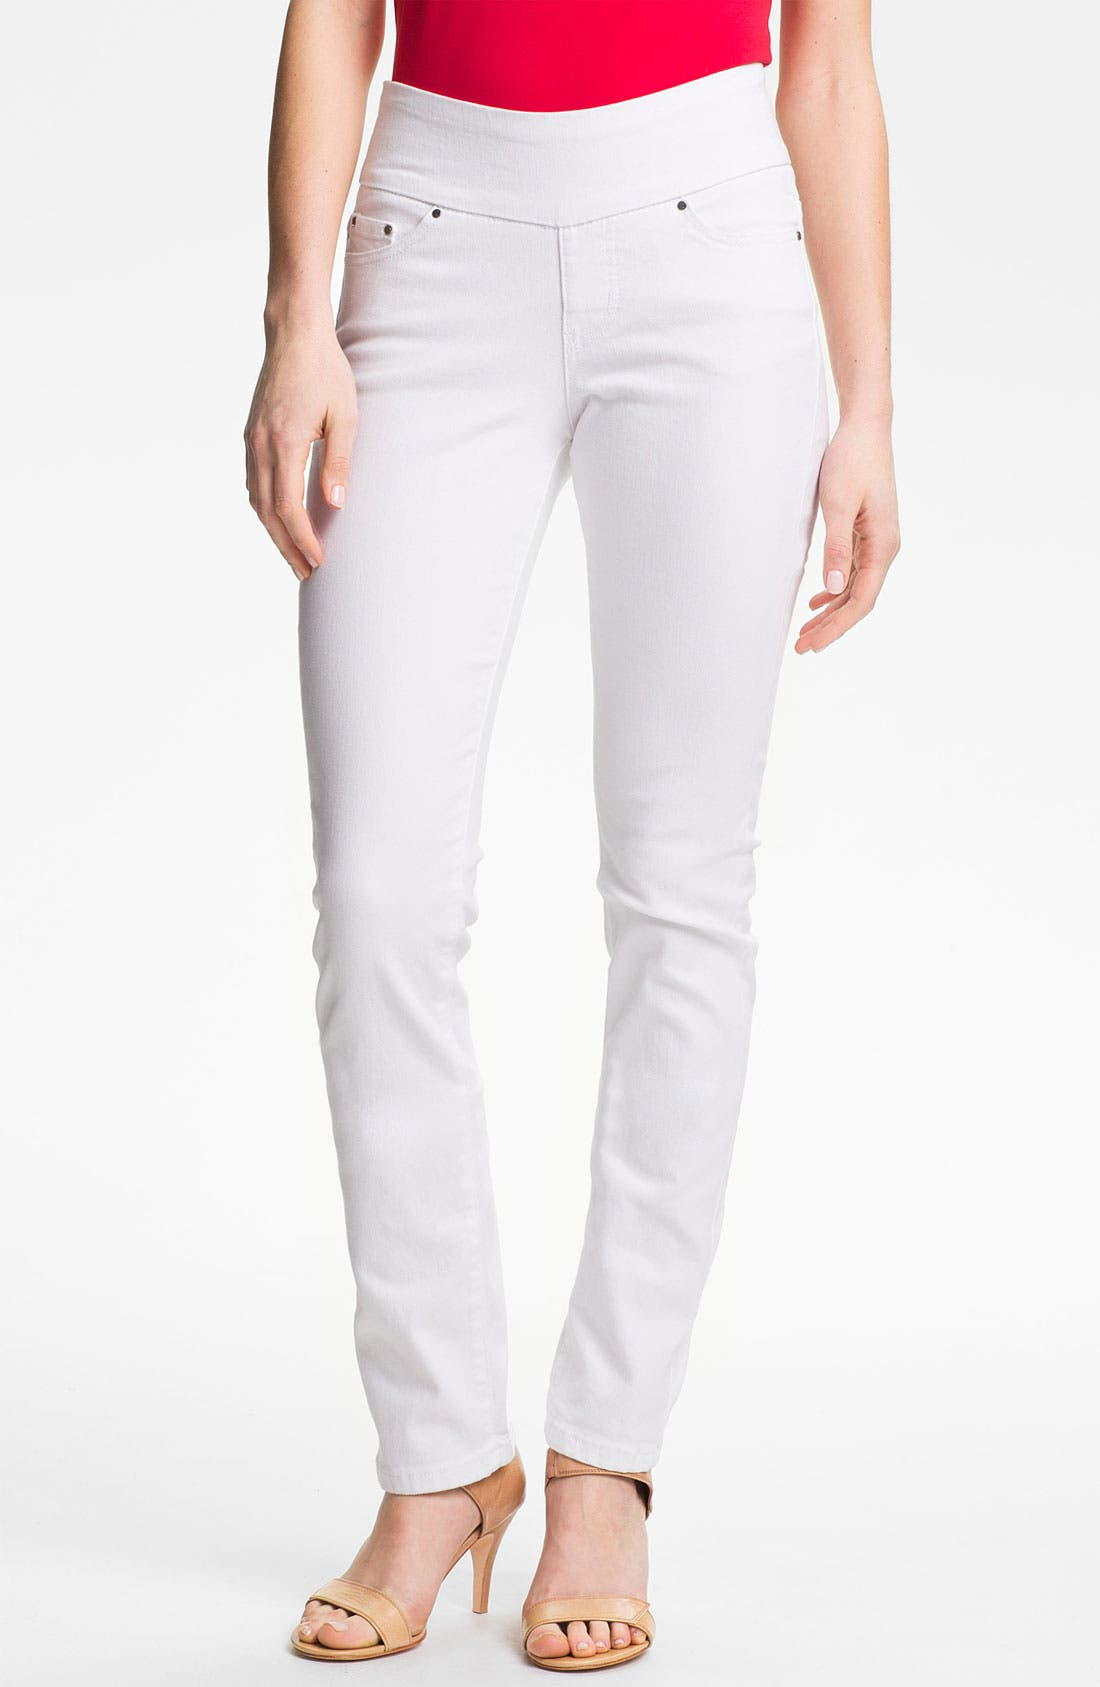 Alternate Image 1 Selected - Jag Jeans 'Peri' Straight Leg Jeans (Petite)